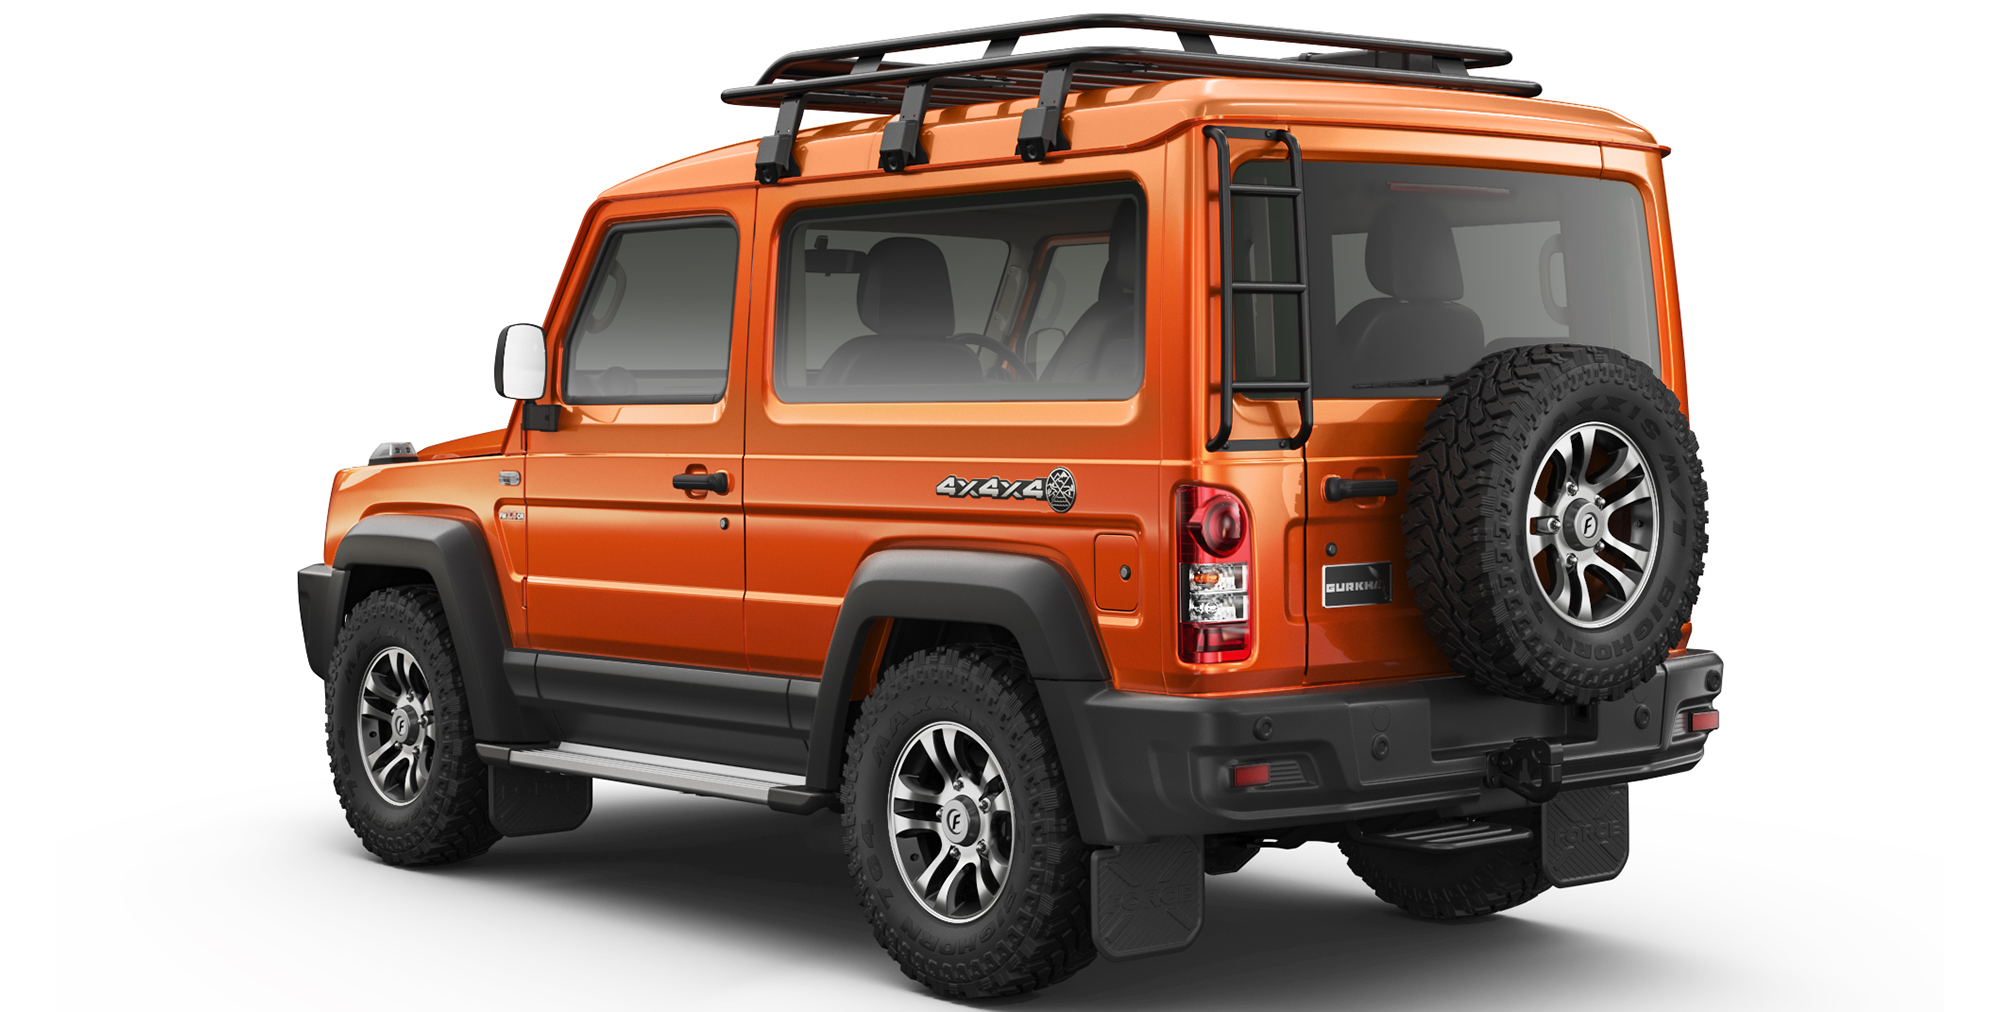 Orange Colour Gurkha 4x4x4 car in india with Rear Ladder